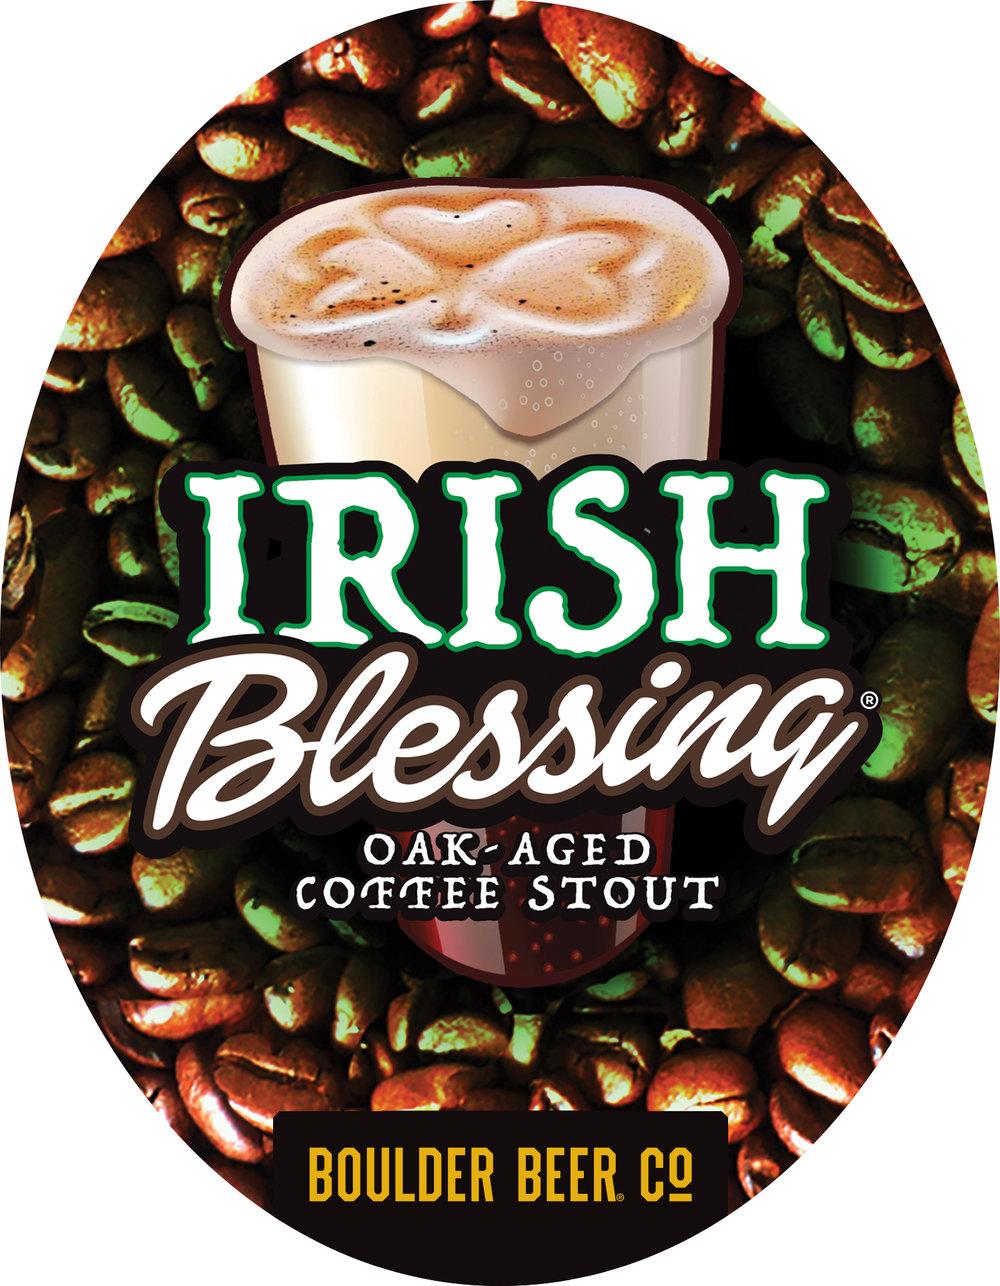 2019 Boulder Beer IrishBlessing Oval.jpg